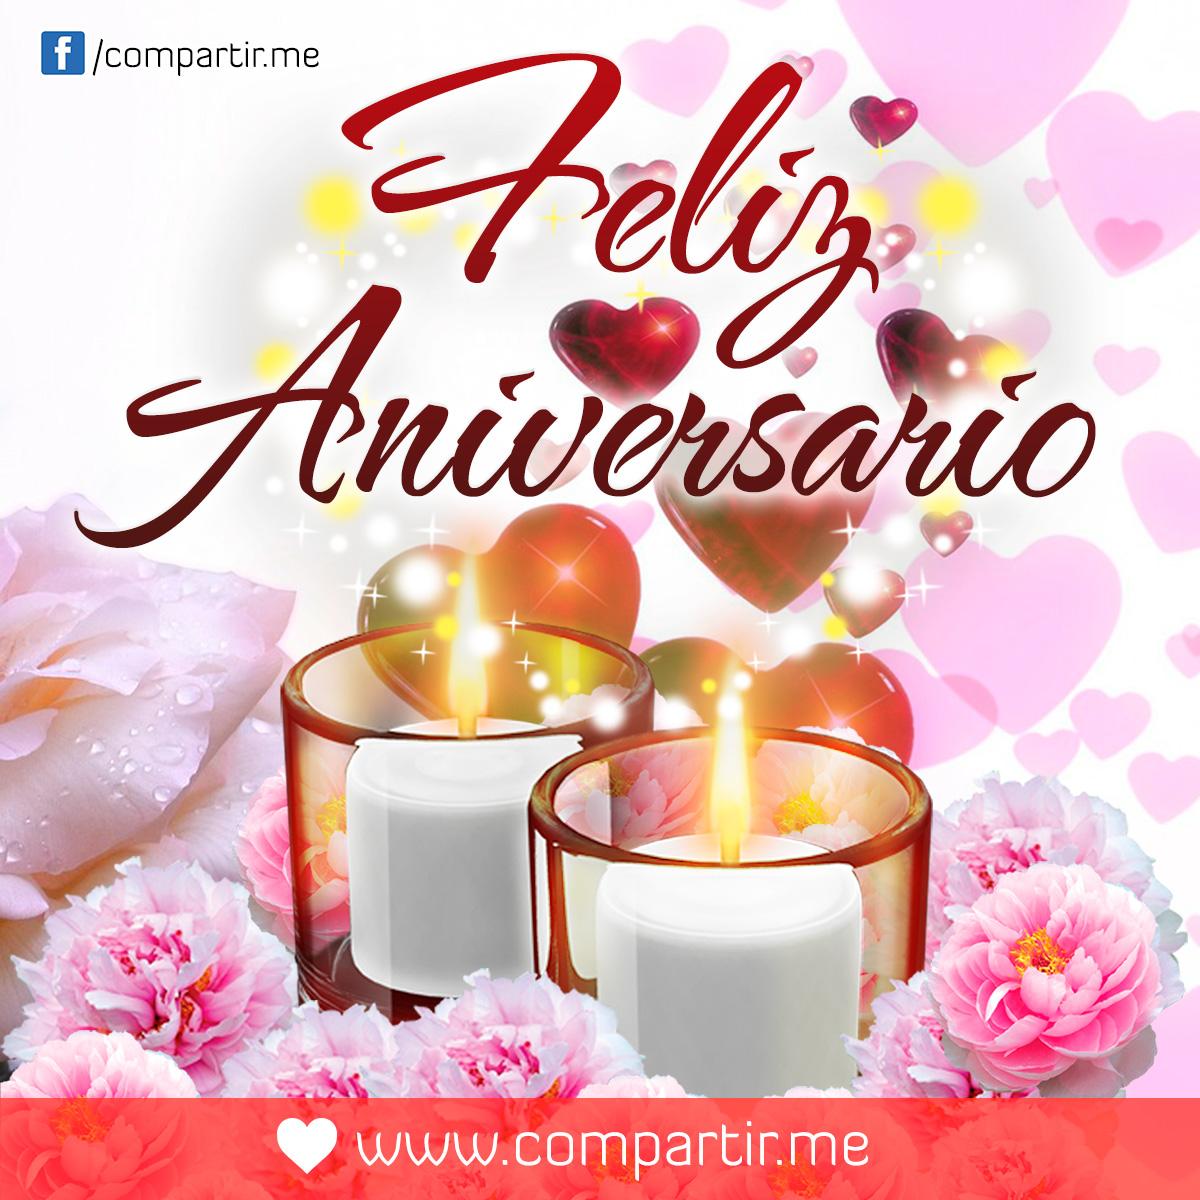 Feliz Aniversario Amor | New Calendar Template Site